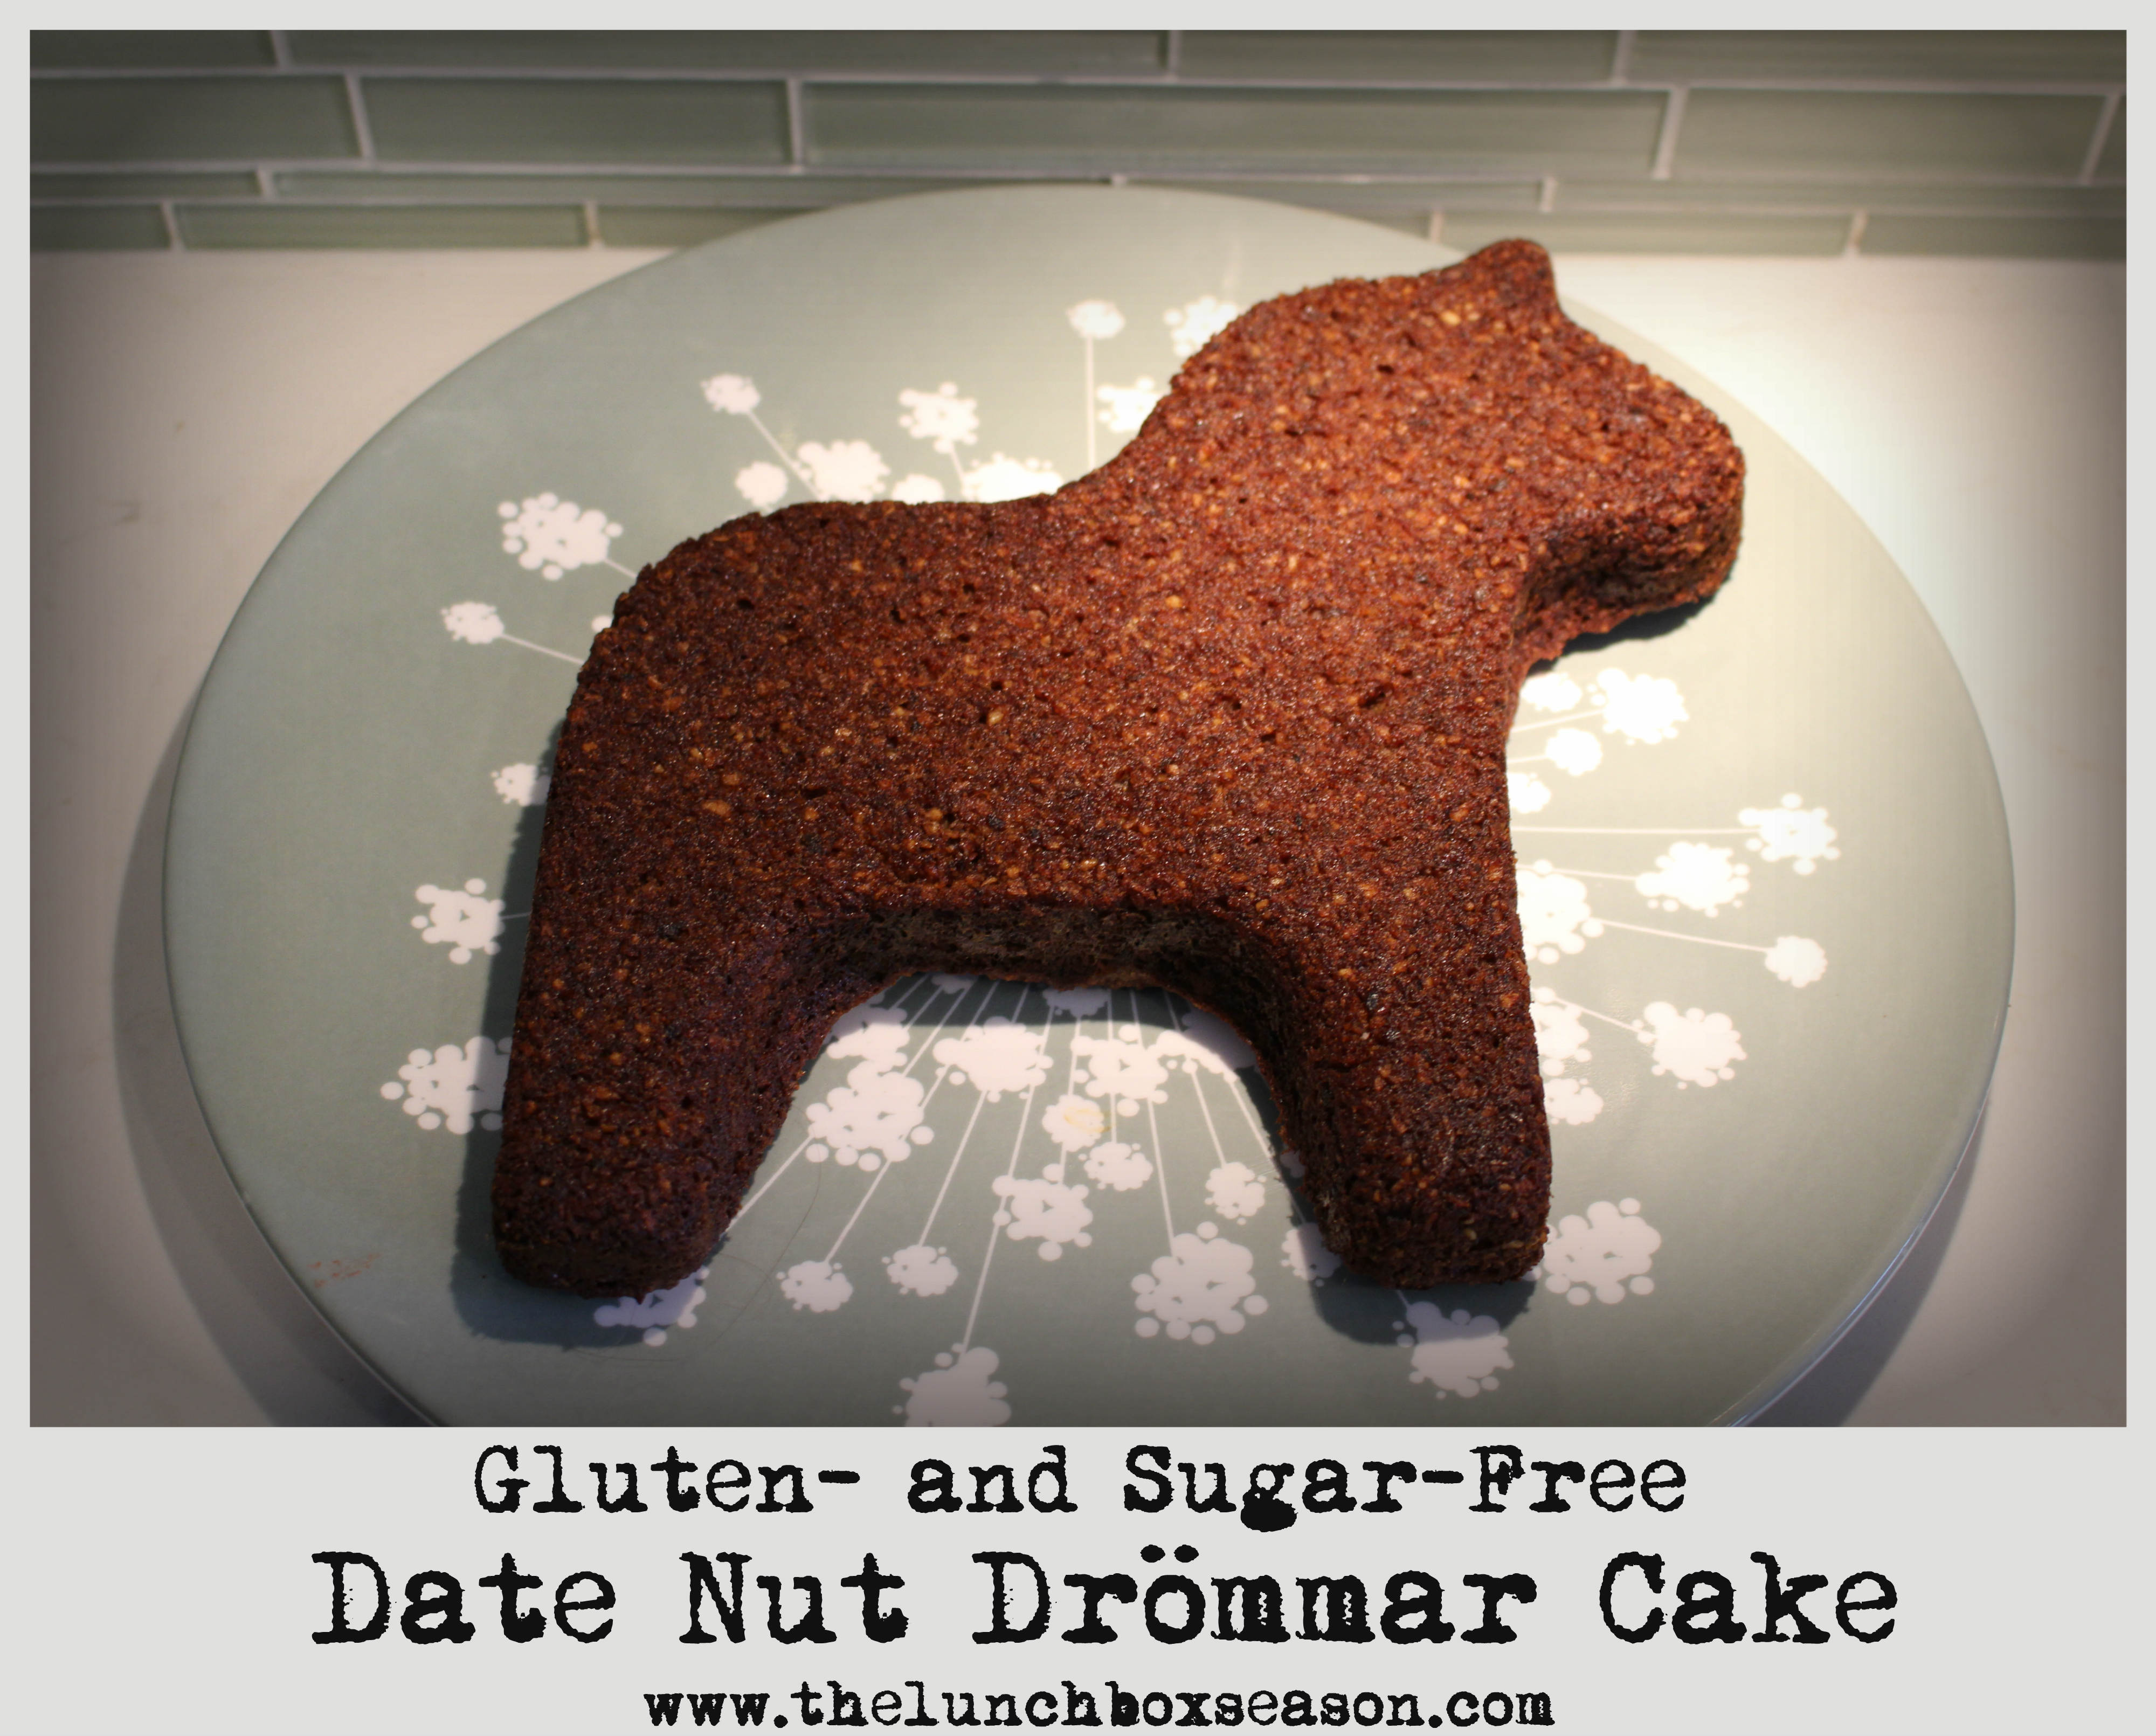 Date Nut Drommar